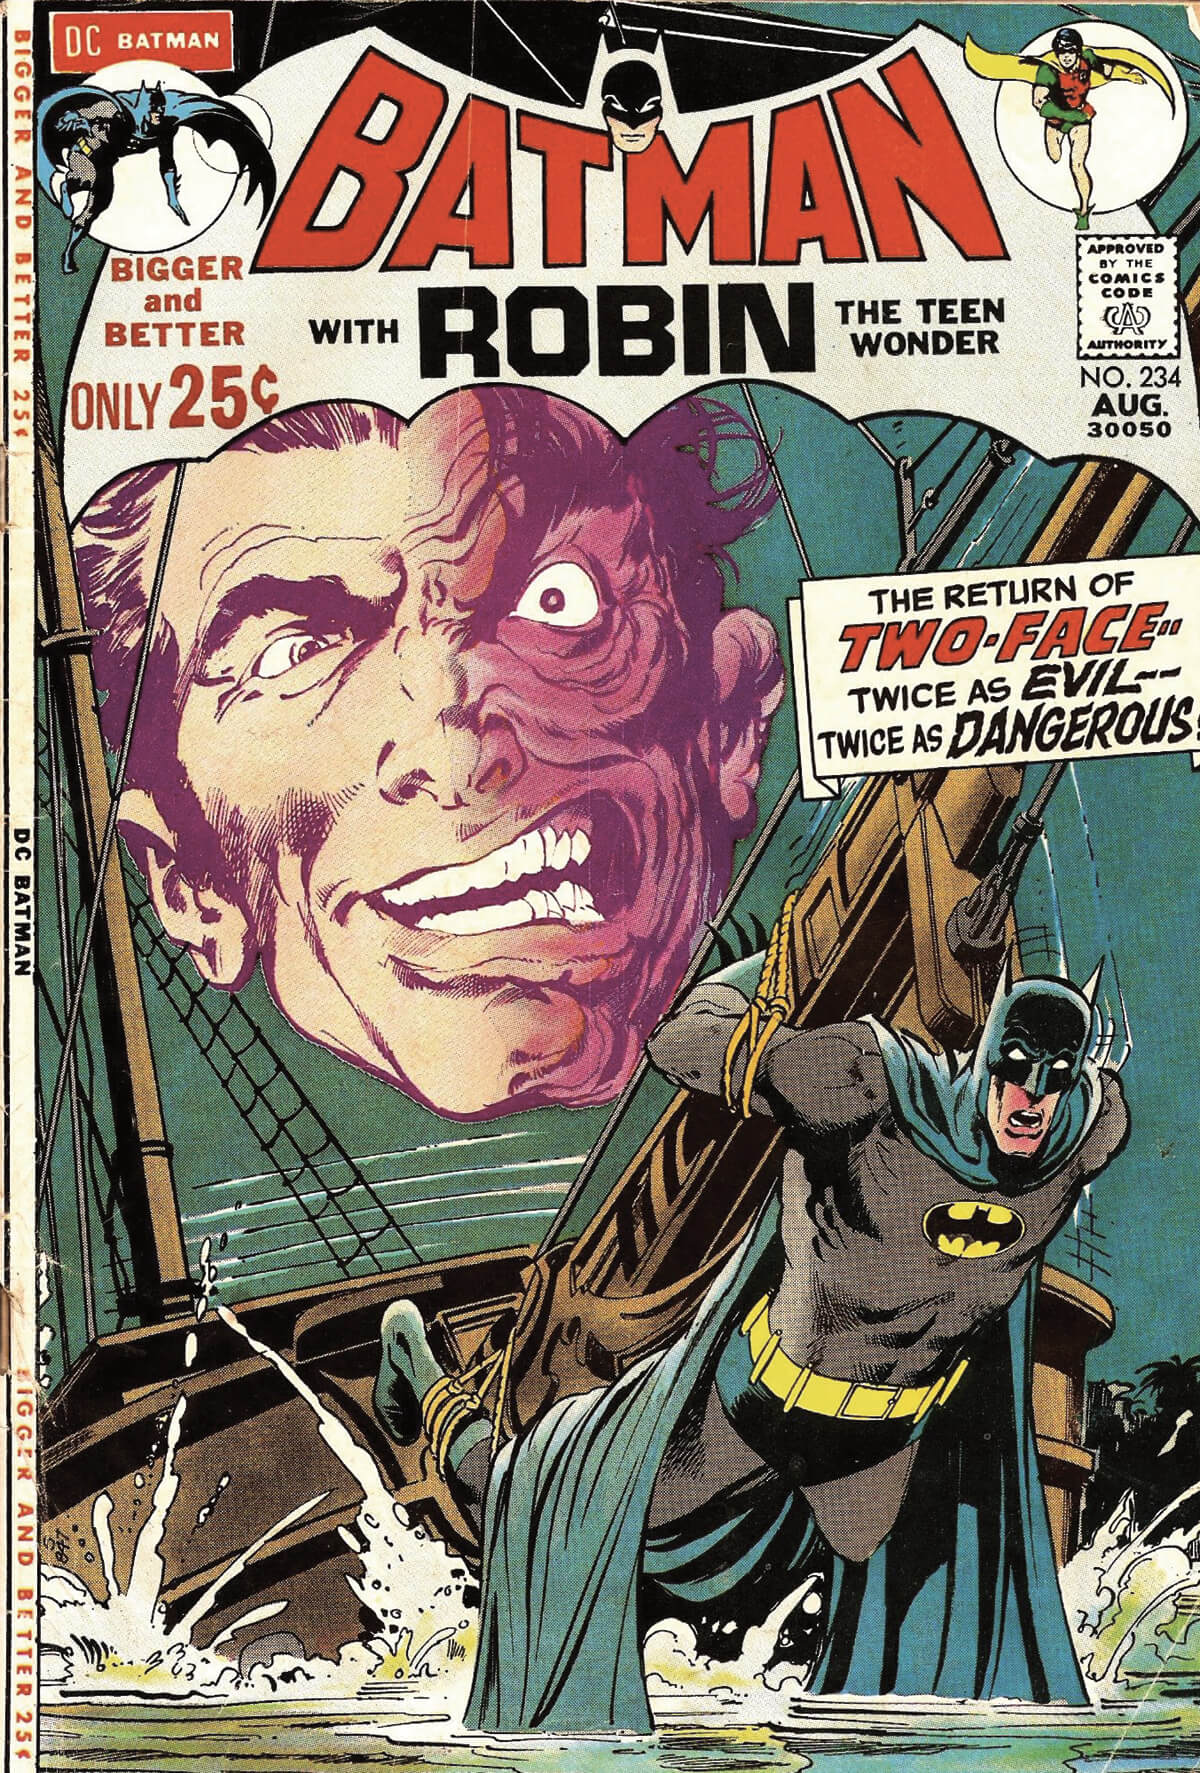 Batman 234 Cover by Neal Adams